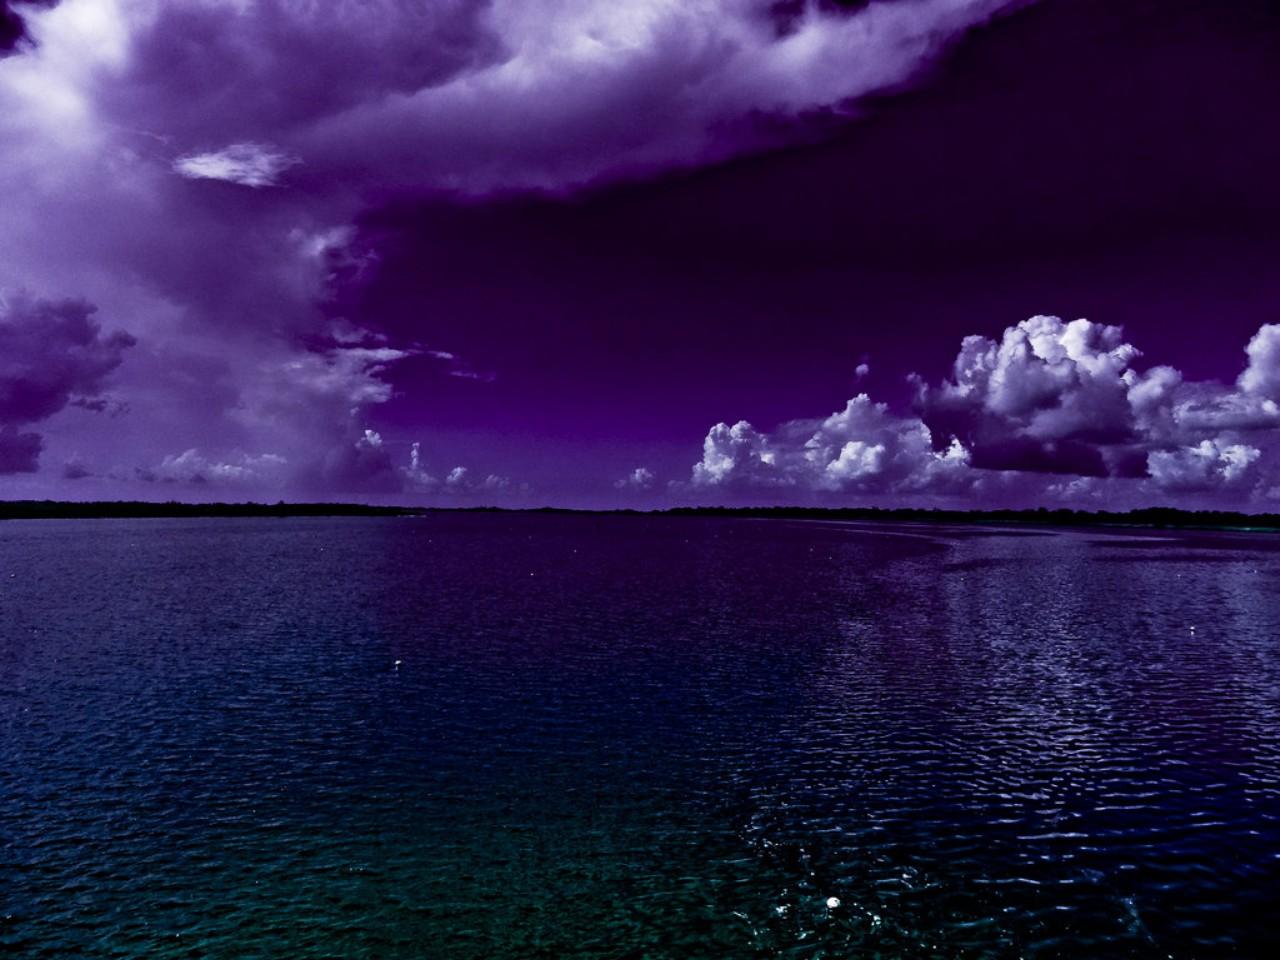 Fall Out Boy Desktop Wallpaper Hd Ocean Wallpaper Europe Hd Desktop Wallpapers 4k Hd